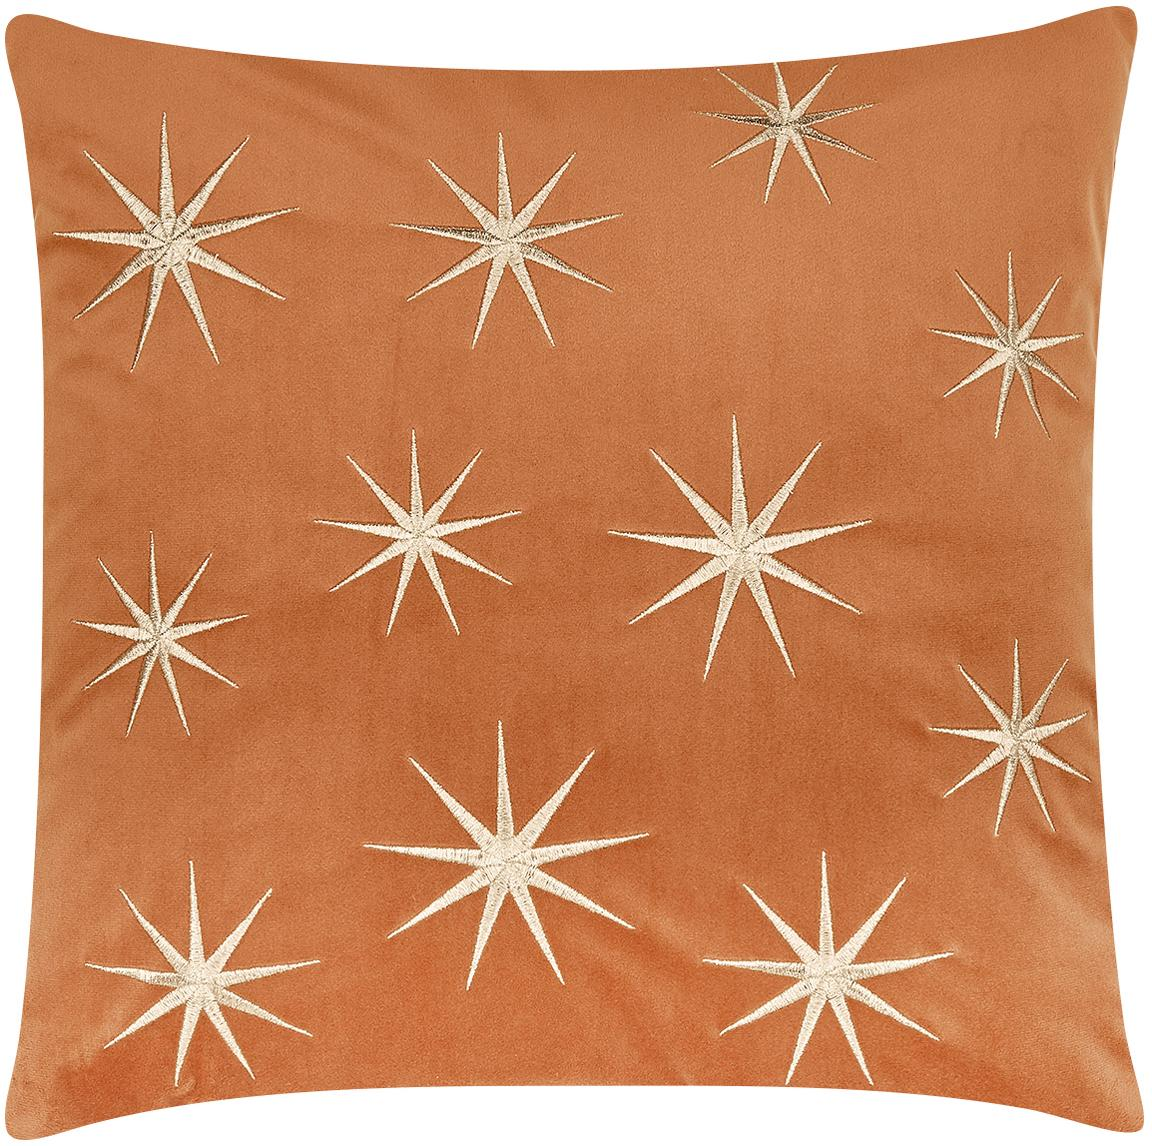 Federa in velluto con stelle ricamate Stars, Arancione, Larg. 45 x Lung. 45 cm